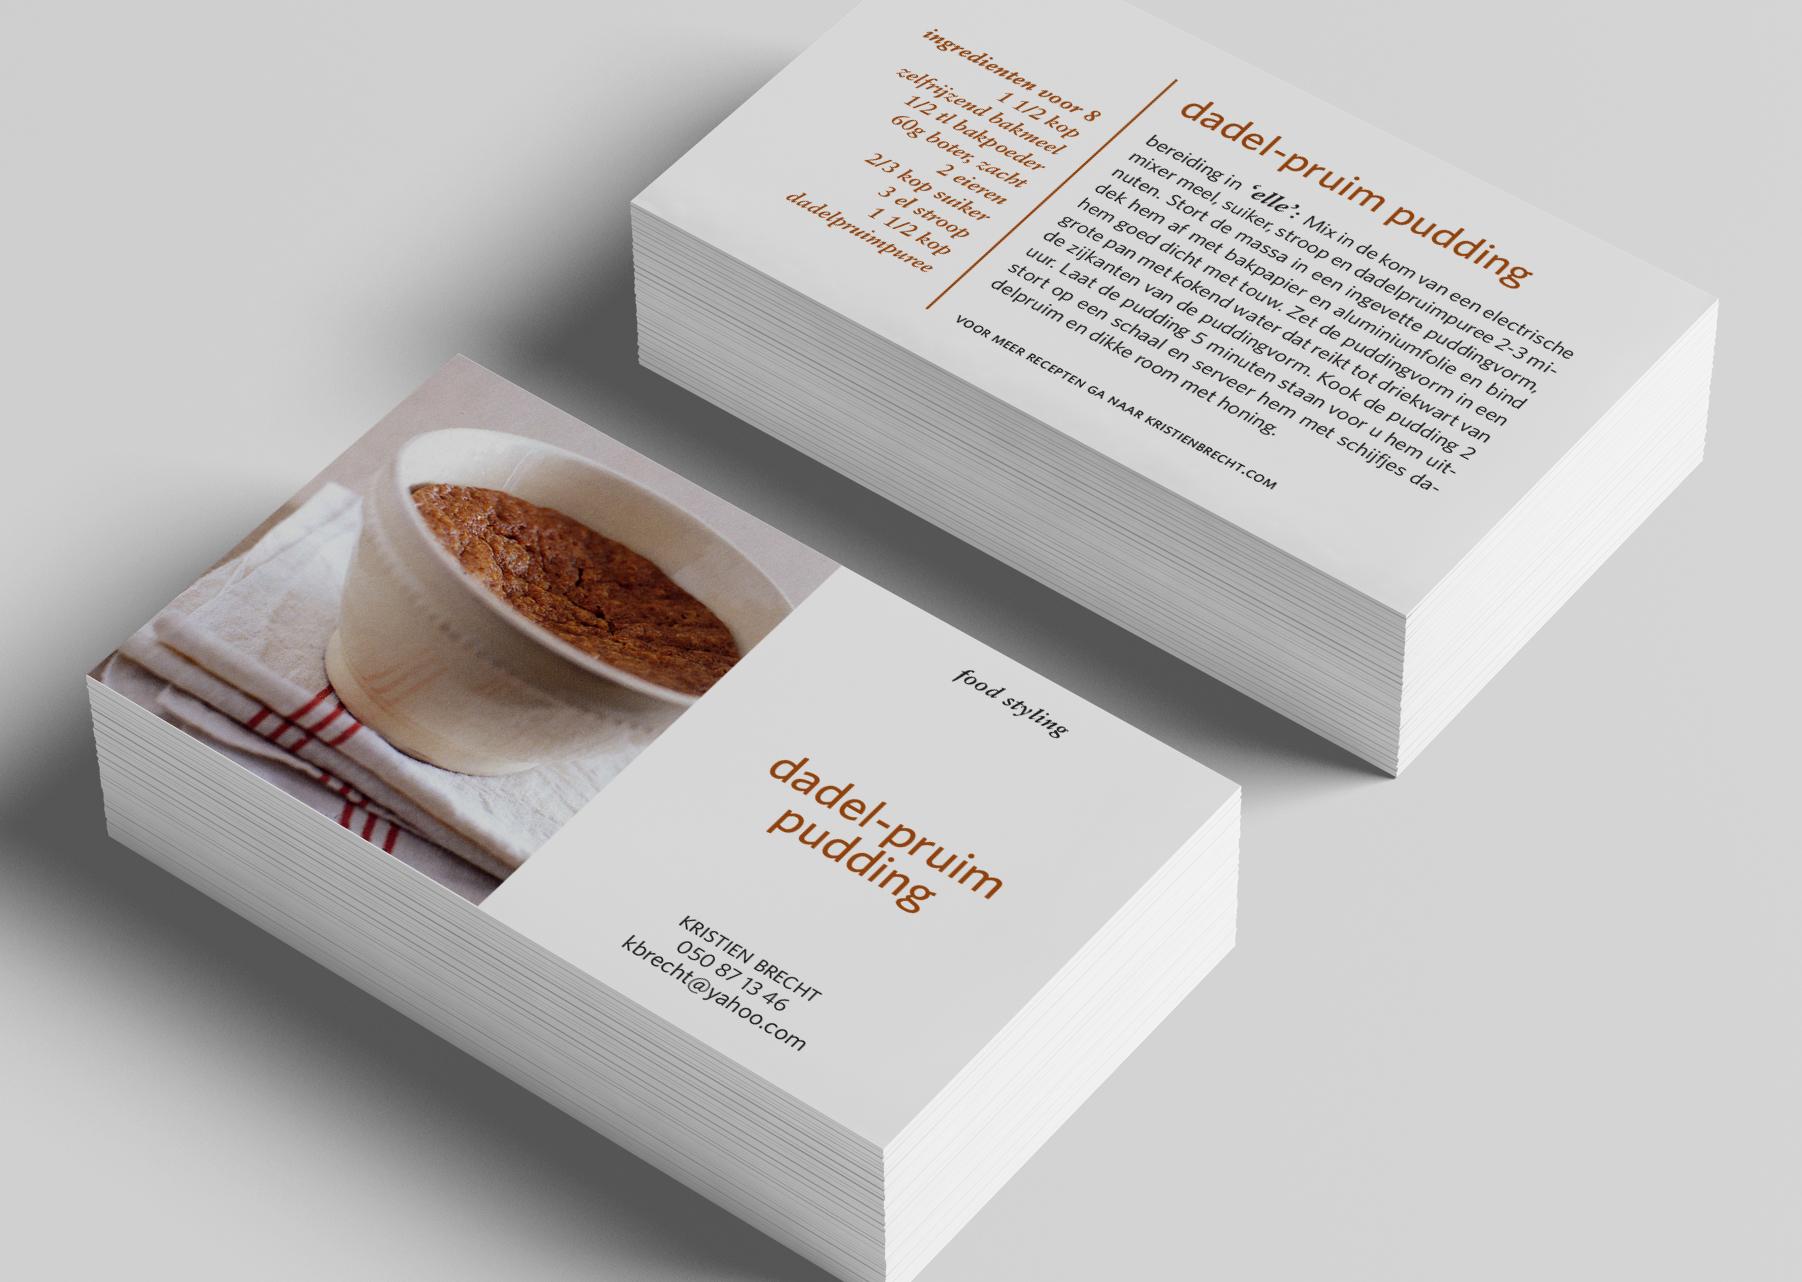 Recipe Card Crop1.jpg